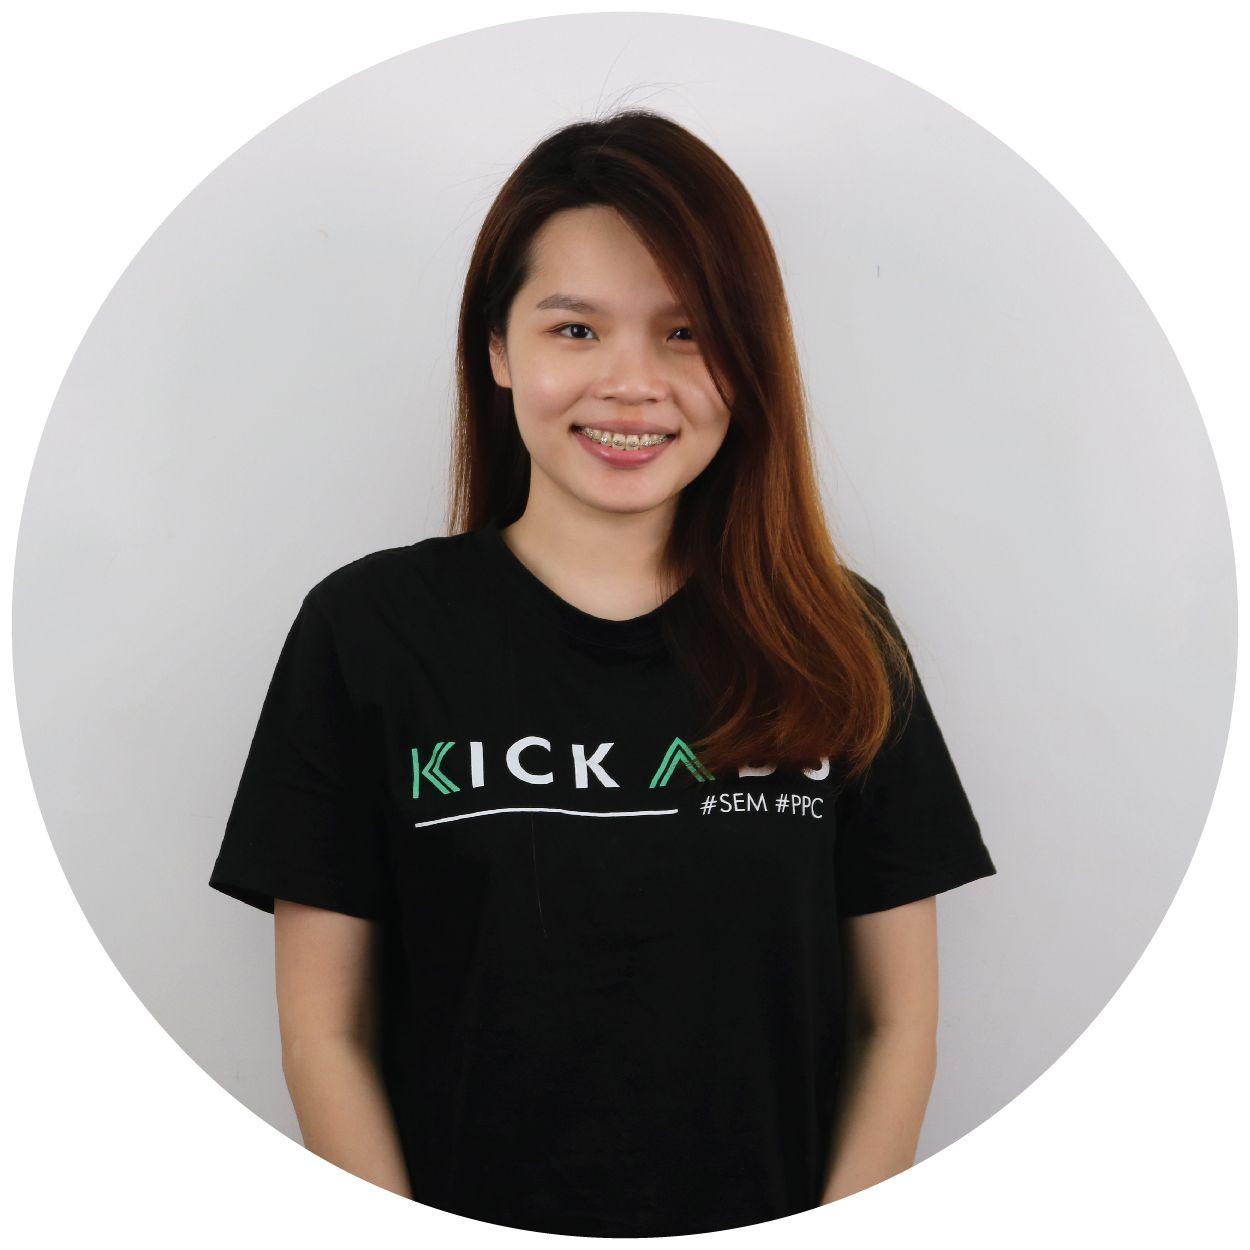 Kick Ads - Chrissy